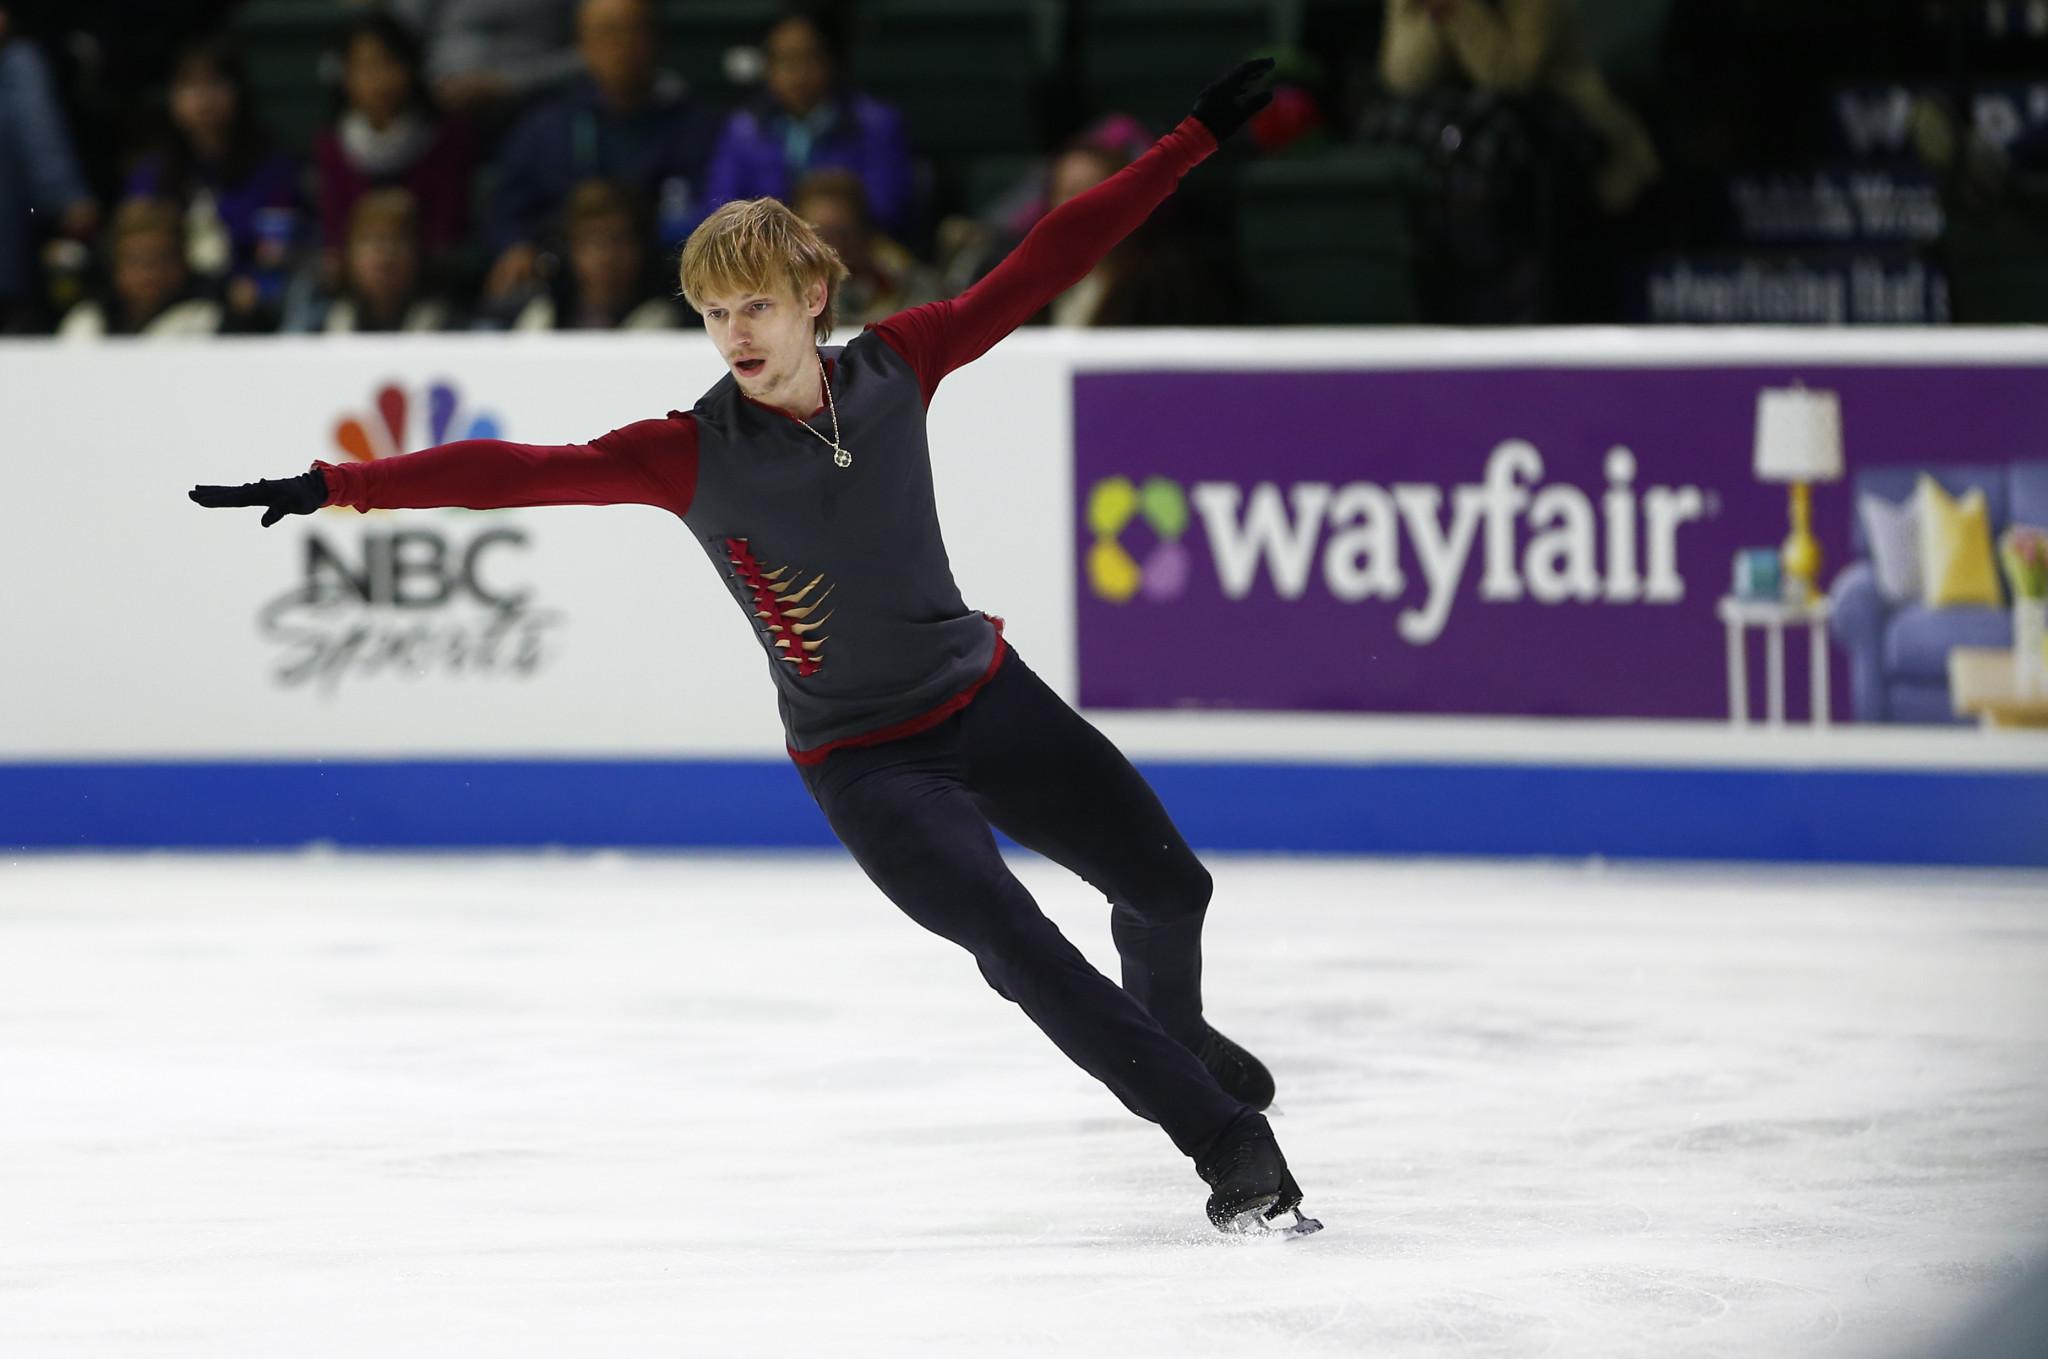 Two-time European medallist Voronov retires from figure skating